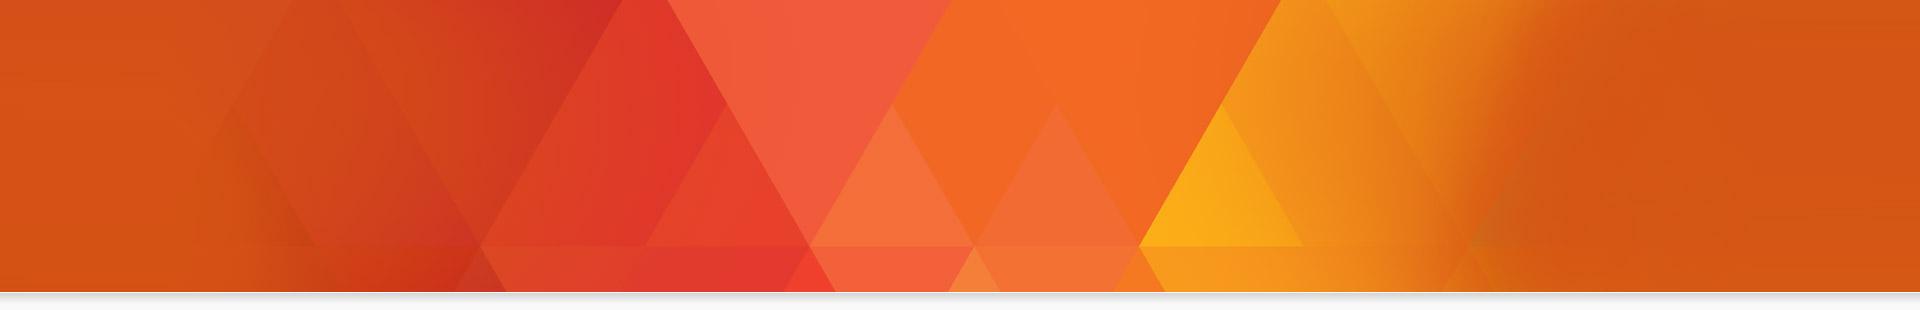 web dev banner